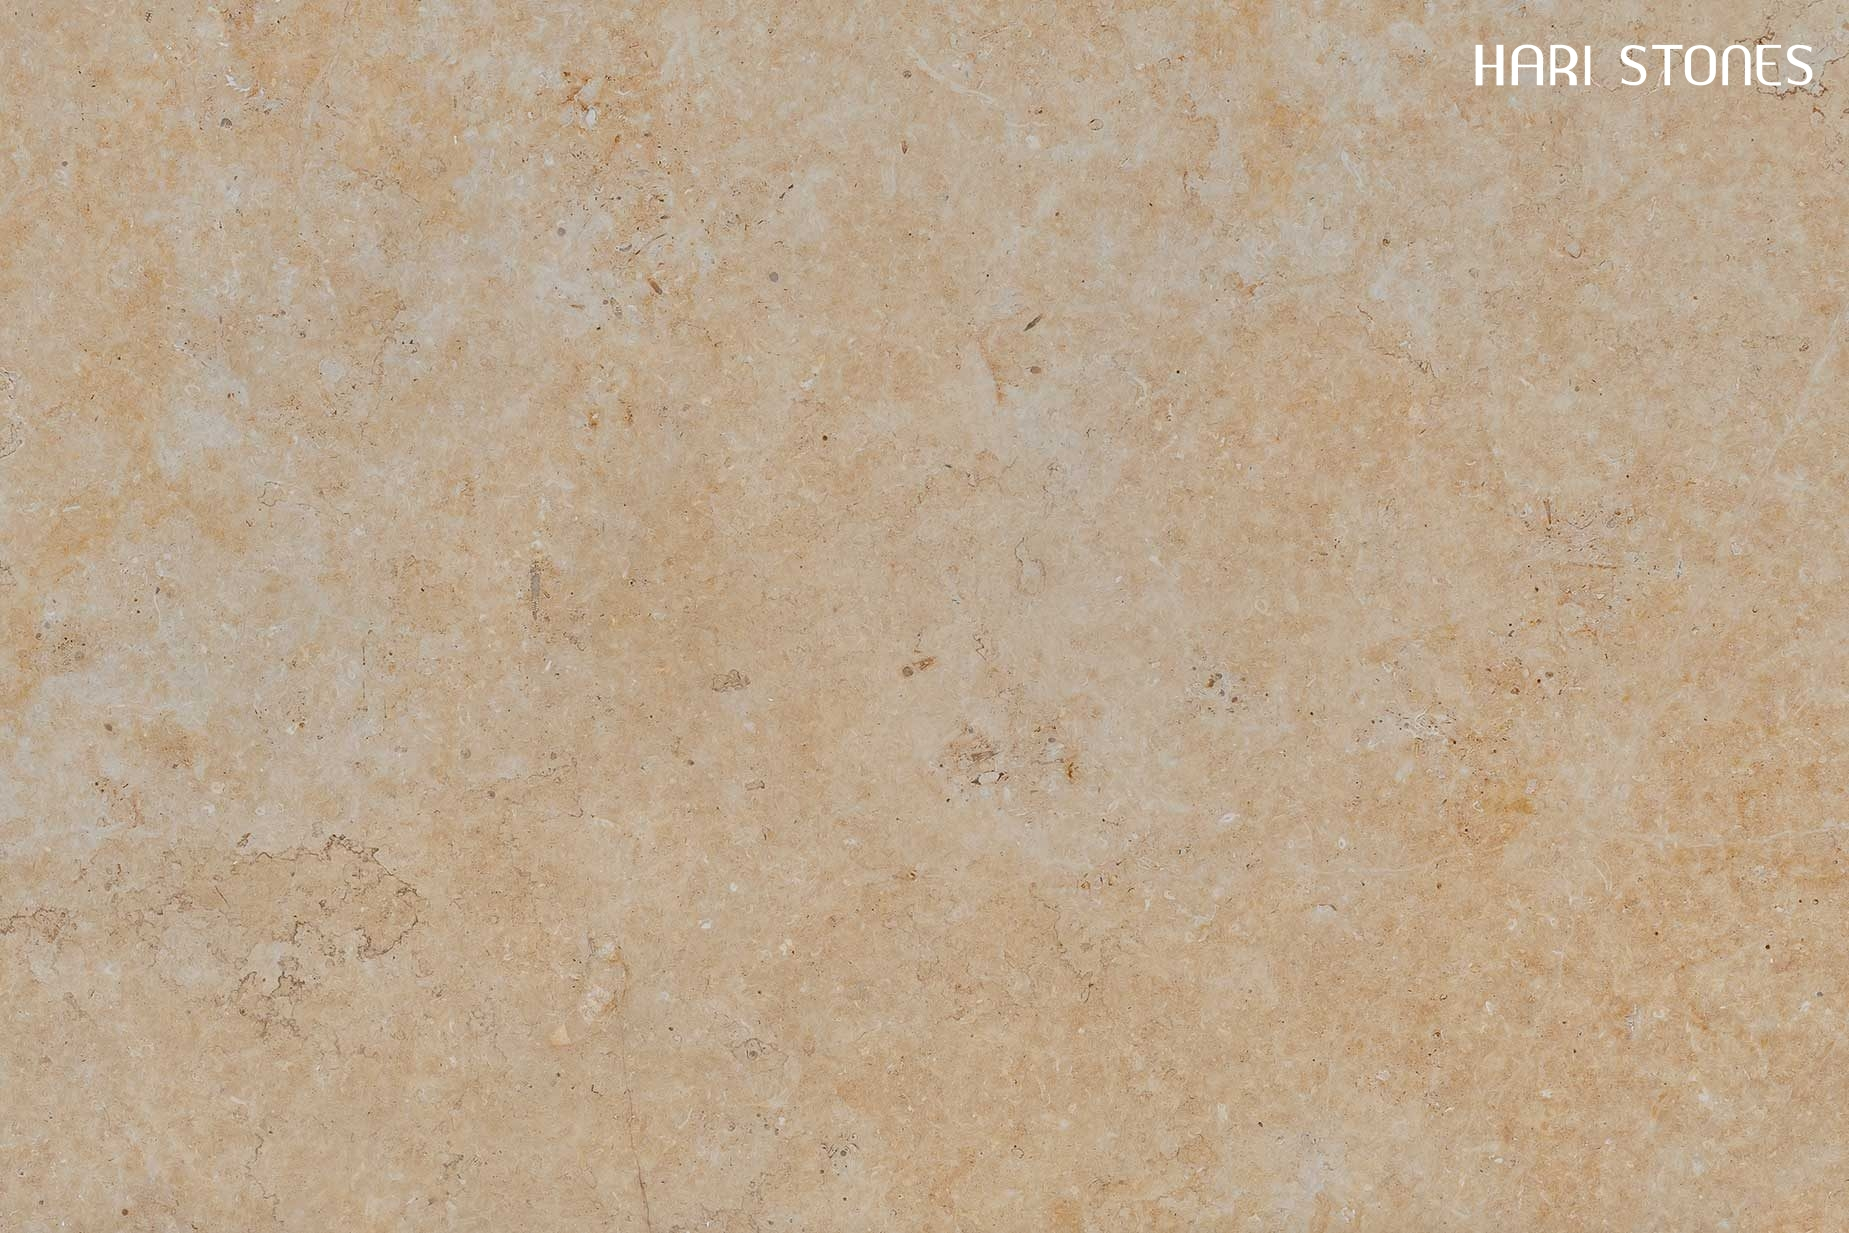 Jerusalem Gold Polished Limestone Slab Suppliers